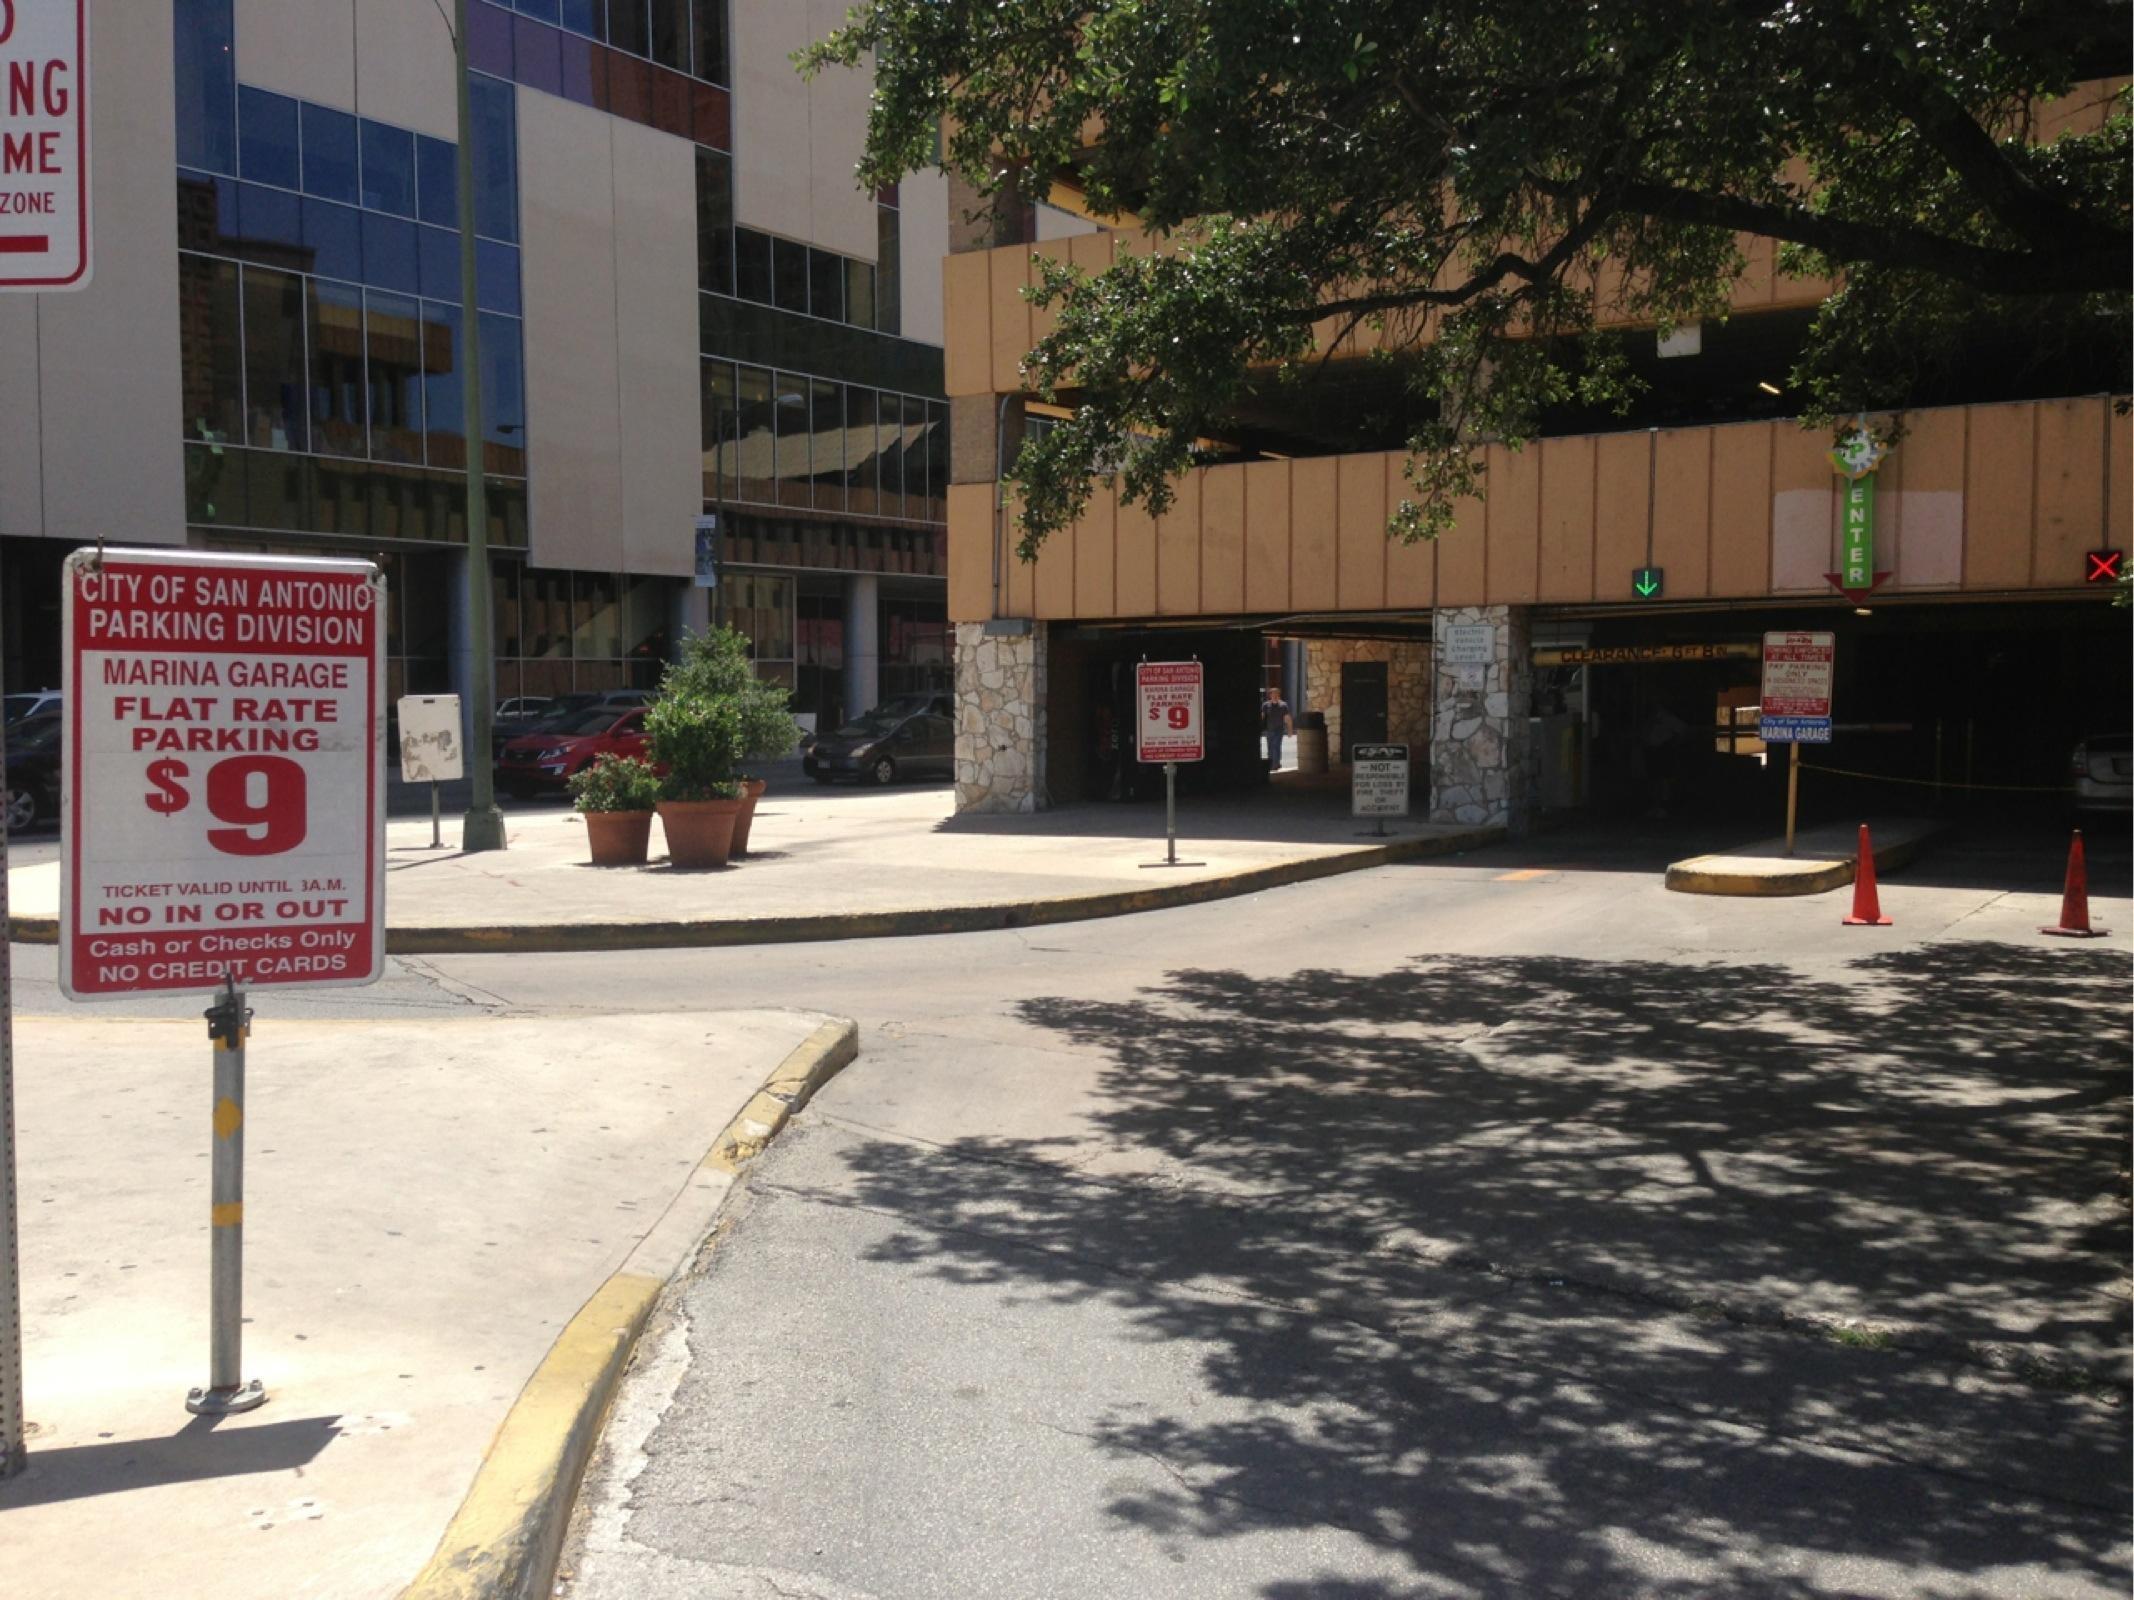 Marina Garage  Parking in San Antonio  ParkMe